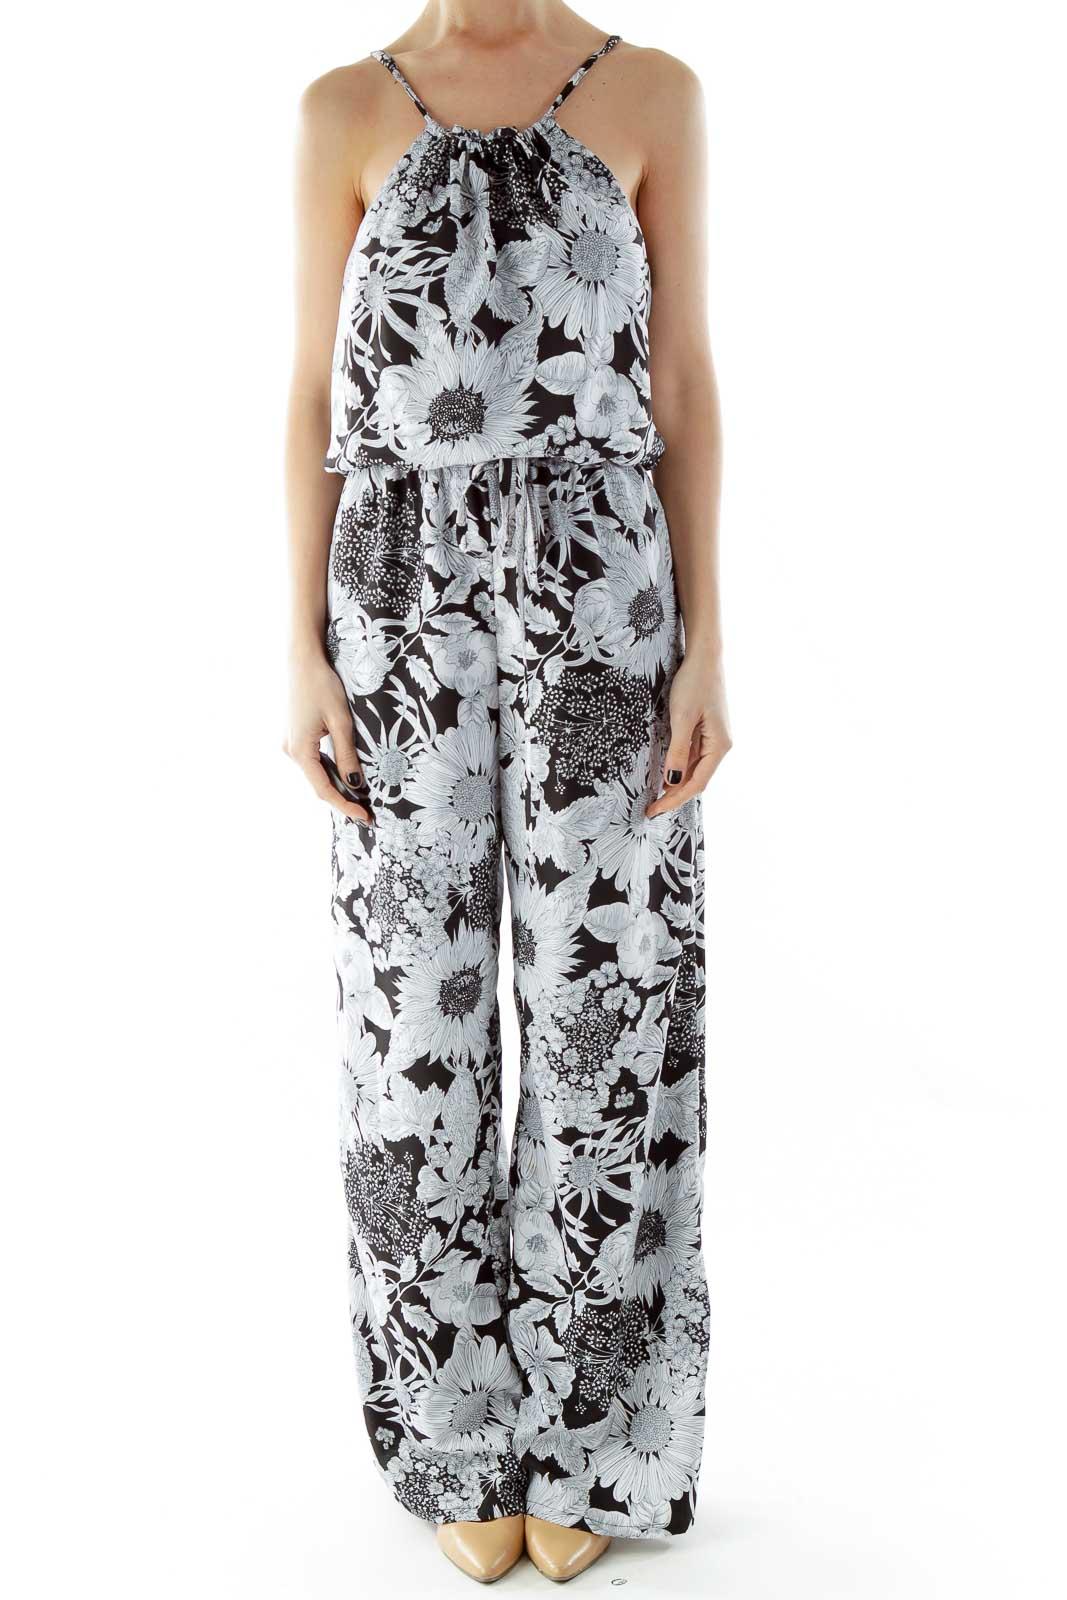 Black White Flower Print Spaghetti Strap Jumpsuit Front